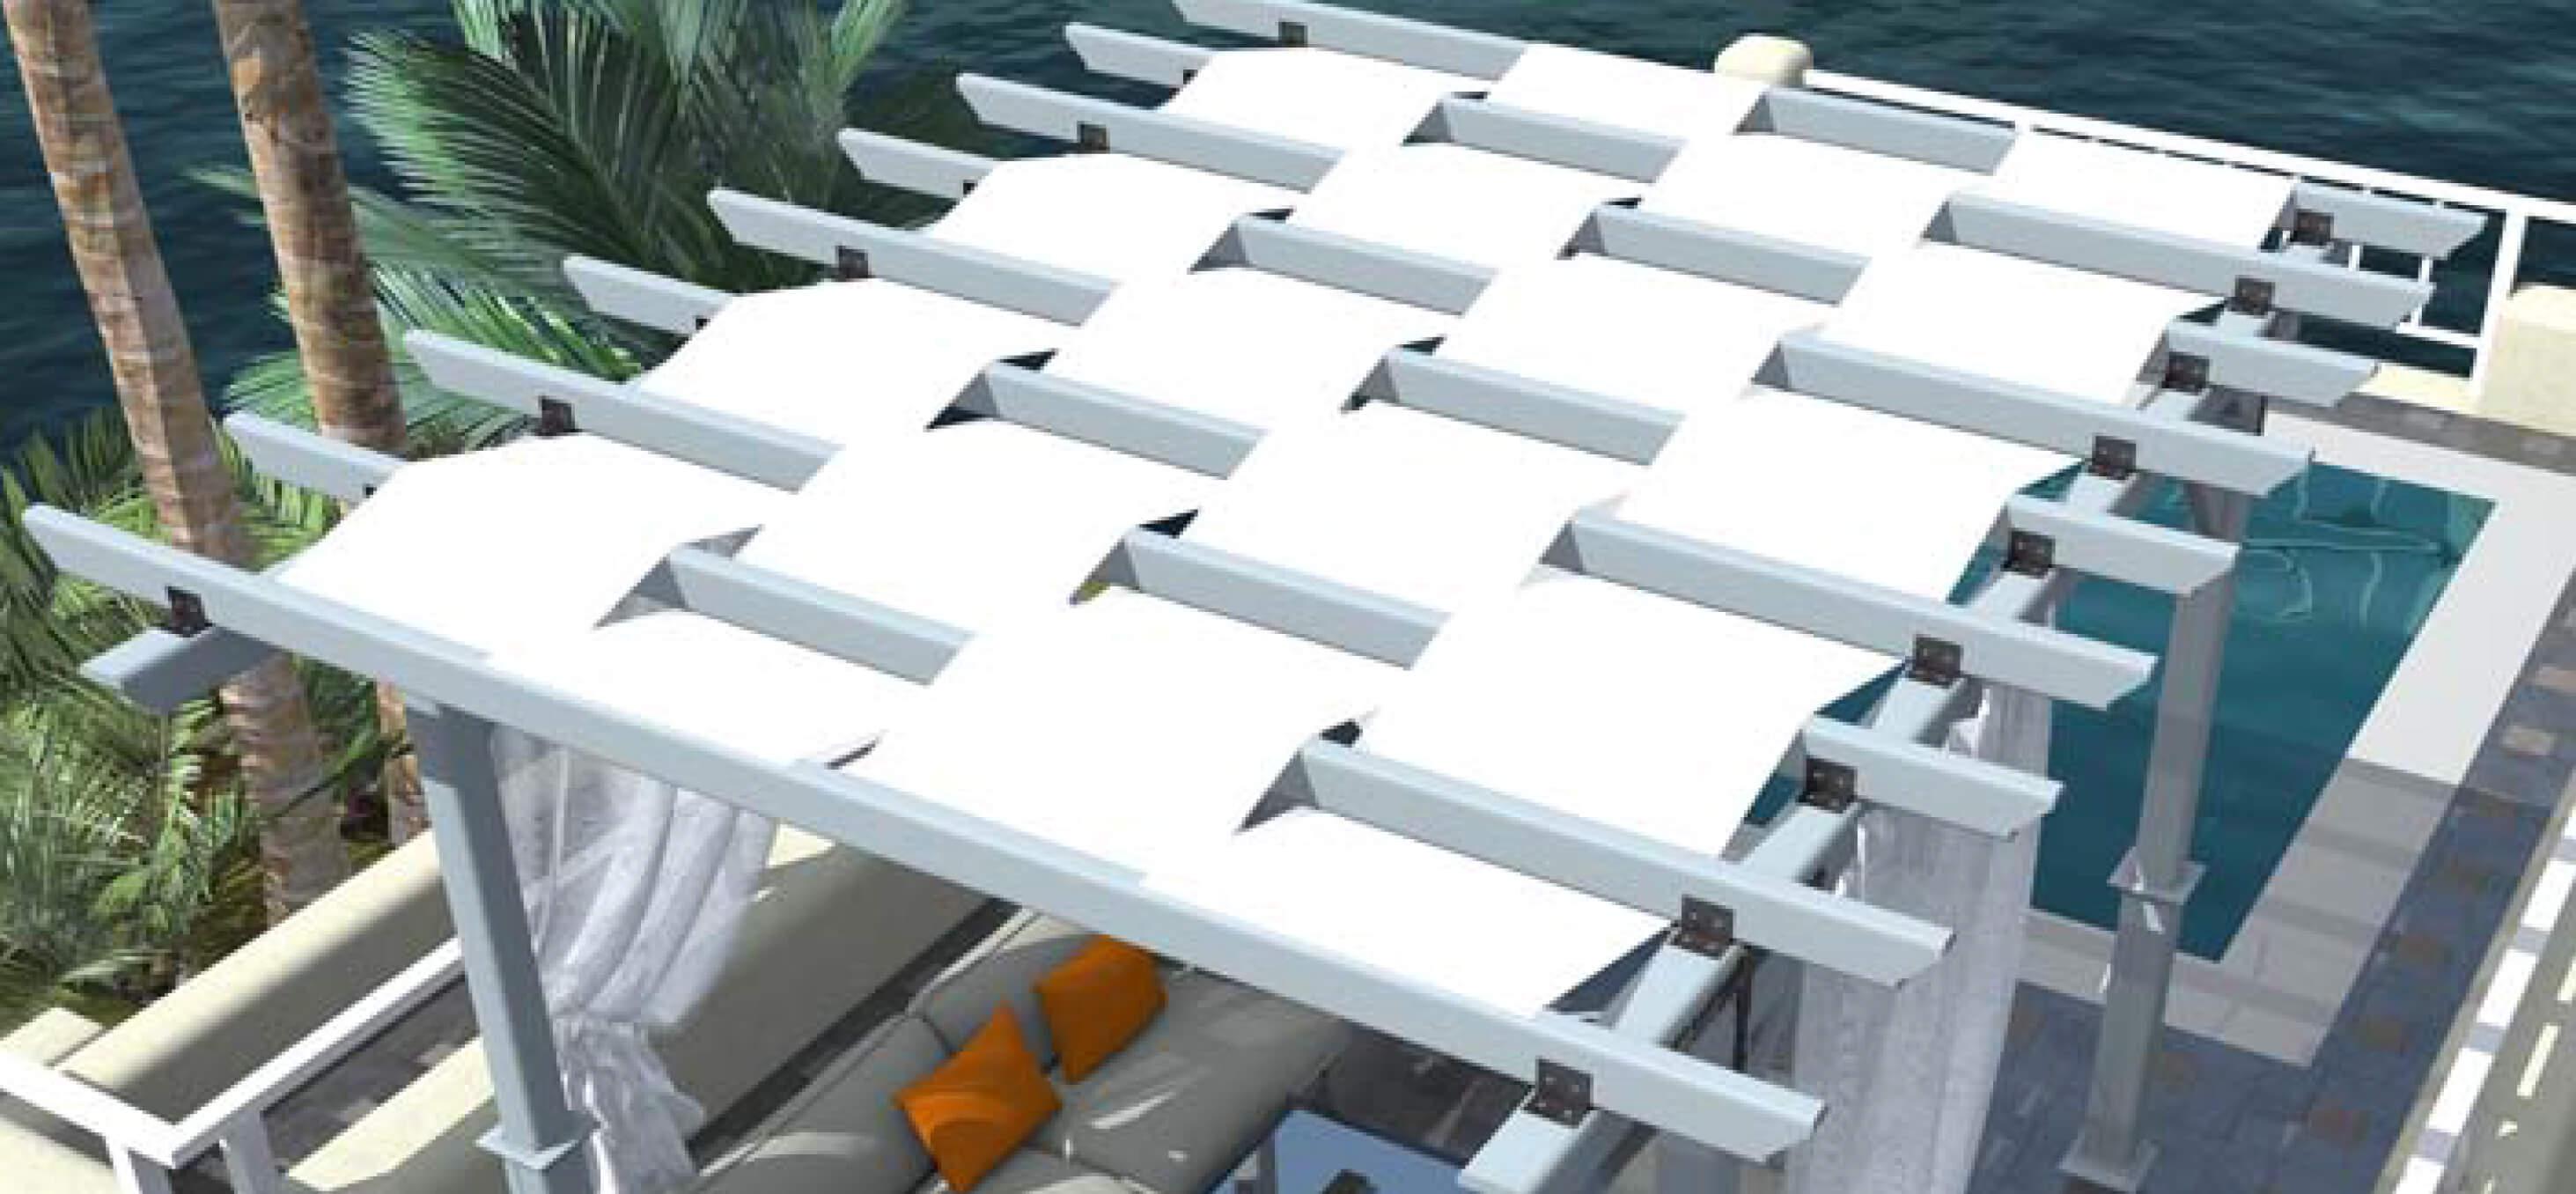 patsalas expert building systems blossom 4